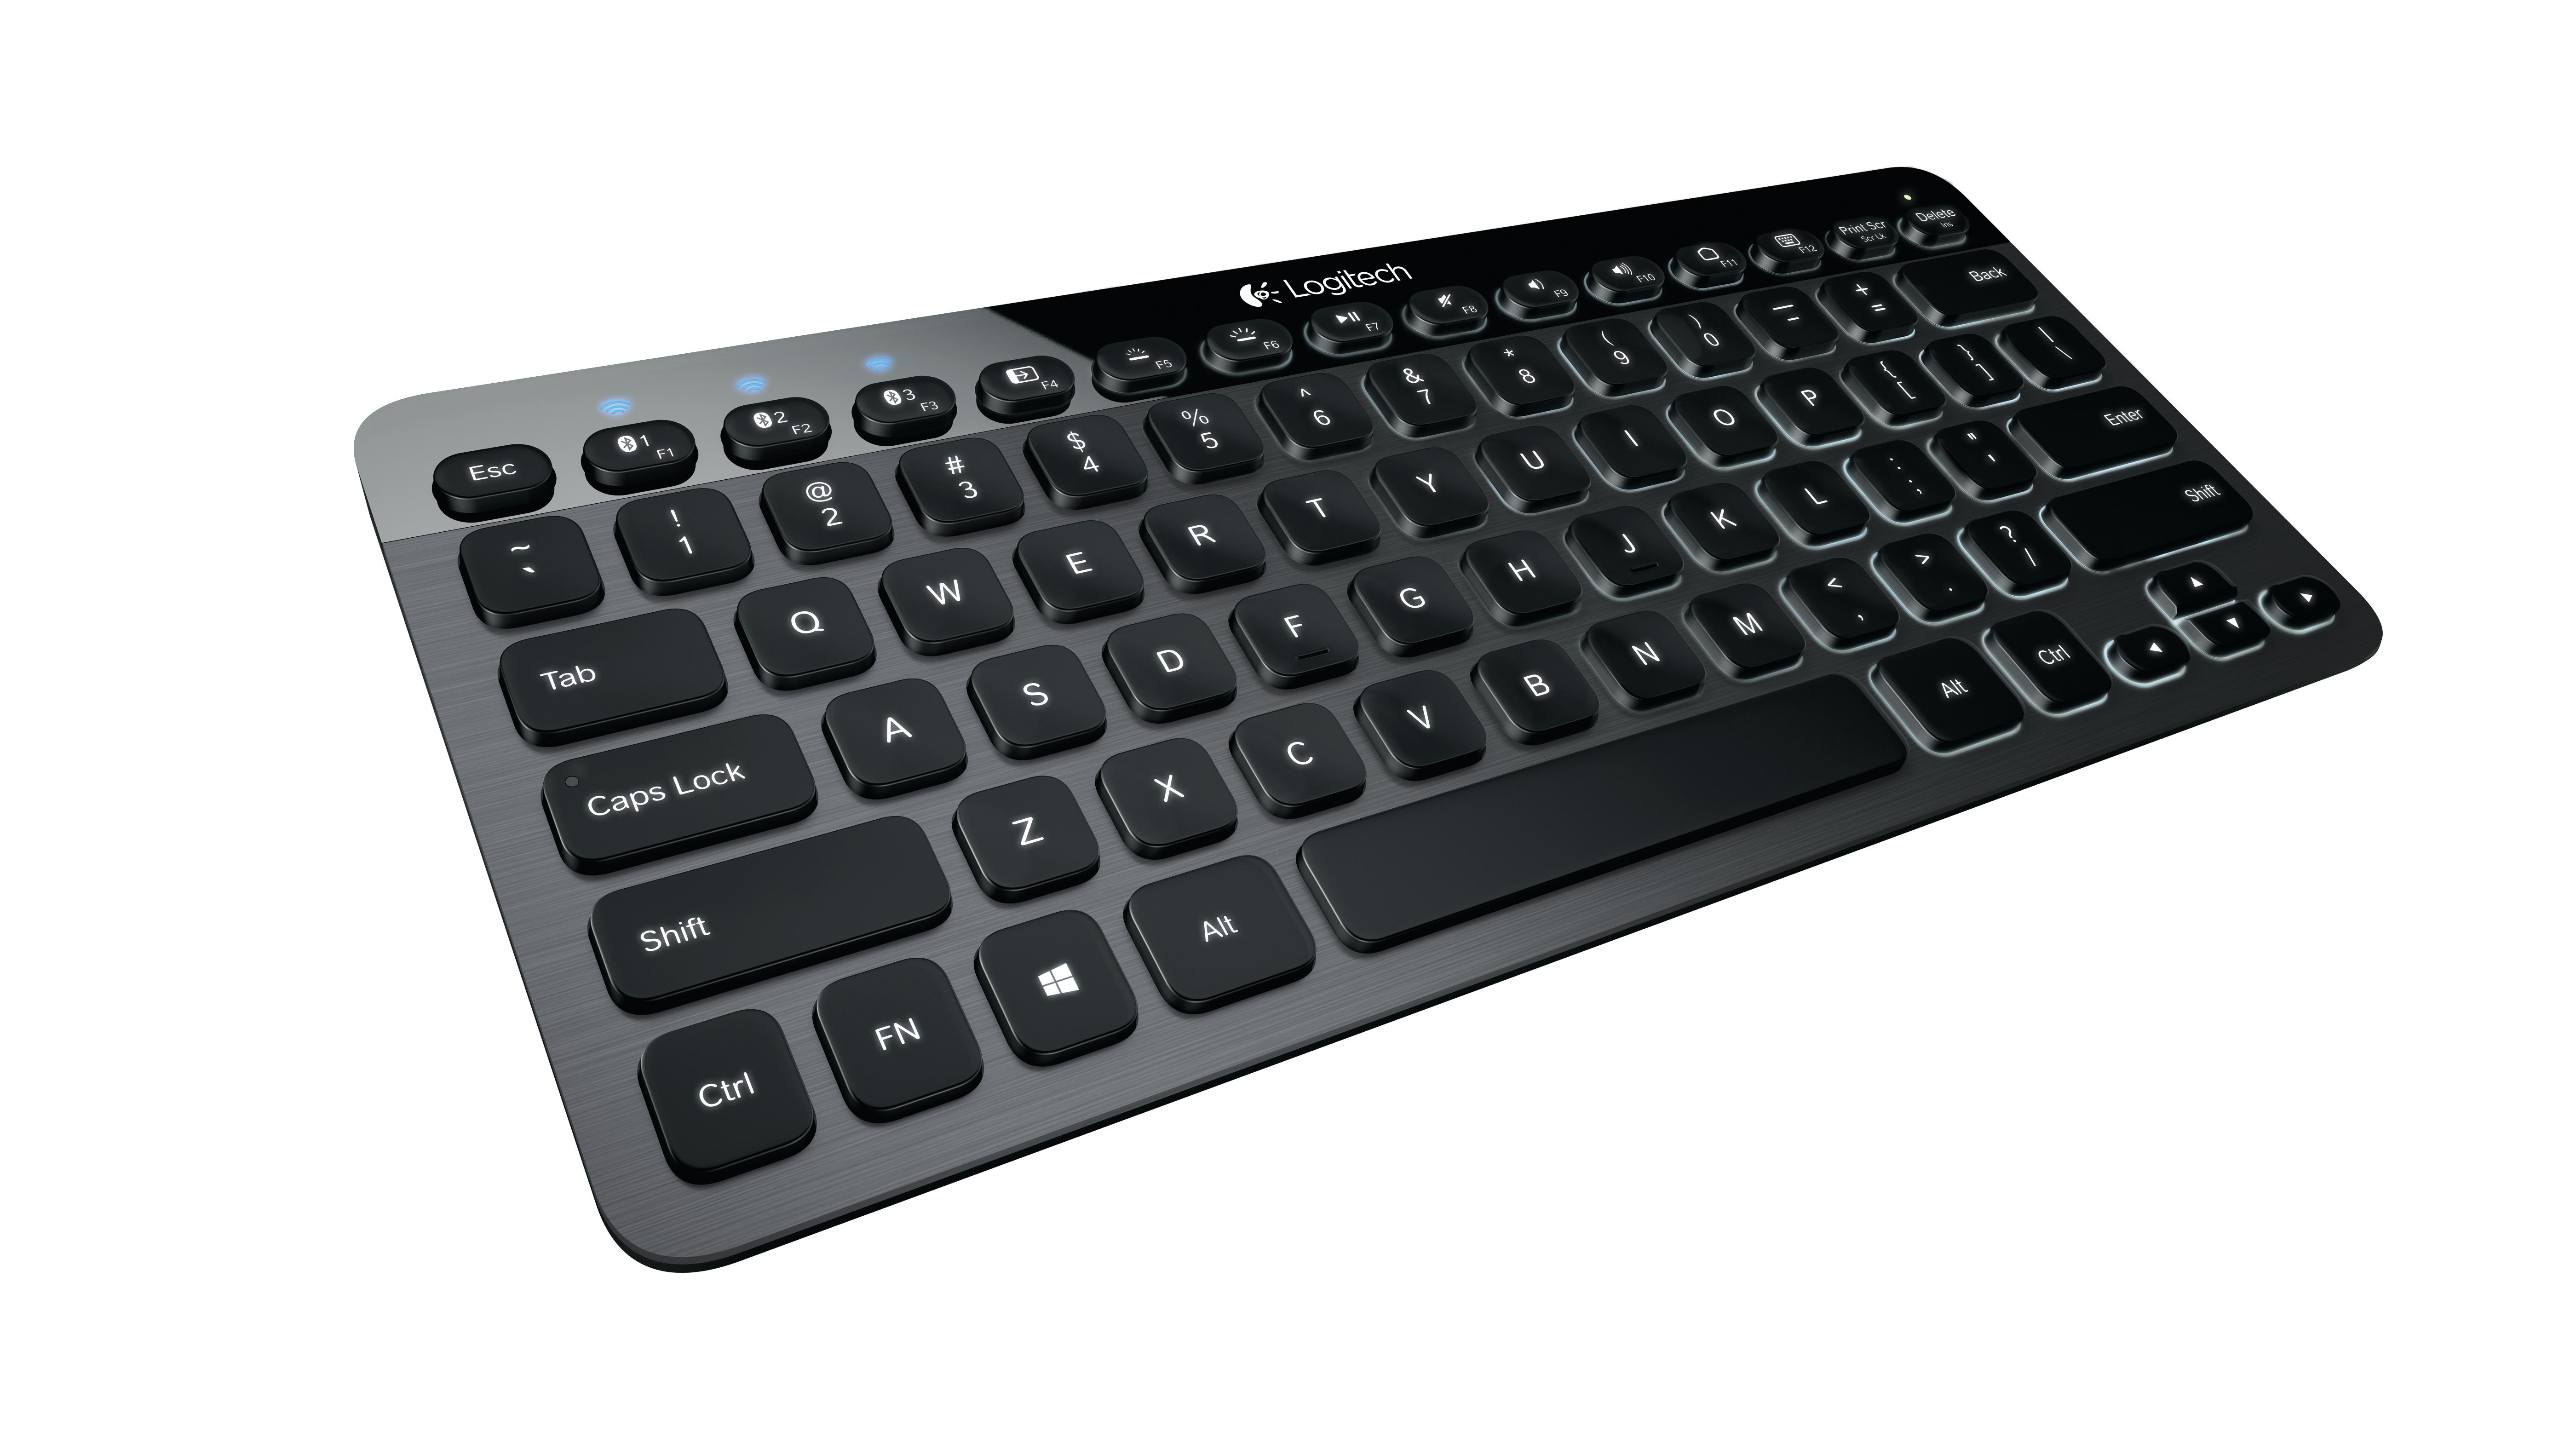 Logitech Bluetooth Illuminated Keyboard K810 Bluetooth QWERTZ Deutsch Aluminium Tastatur für Mobilgeräte